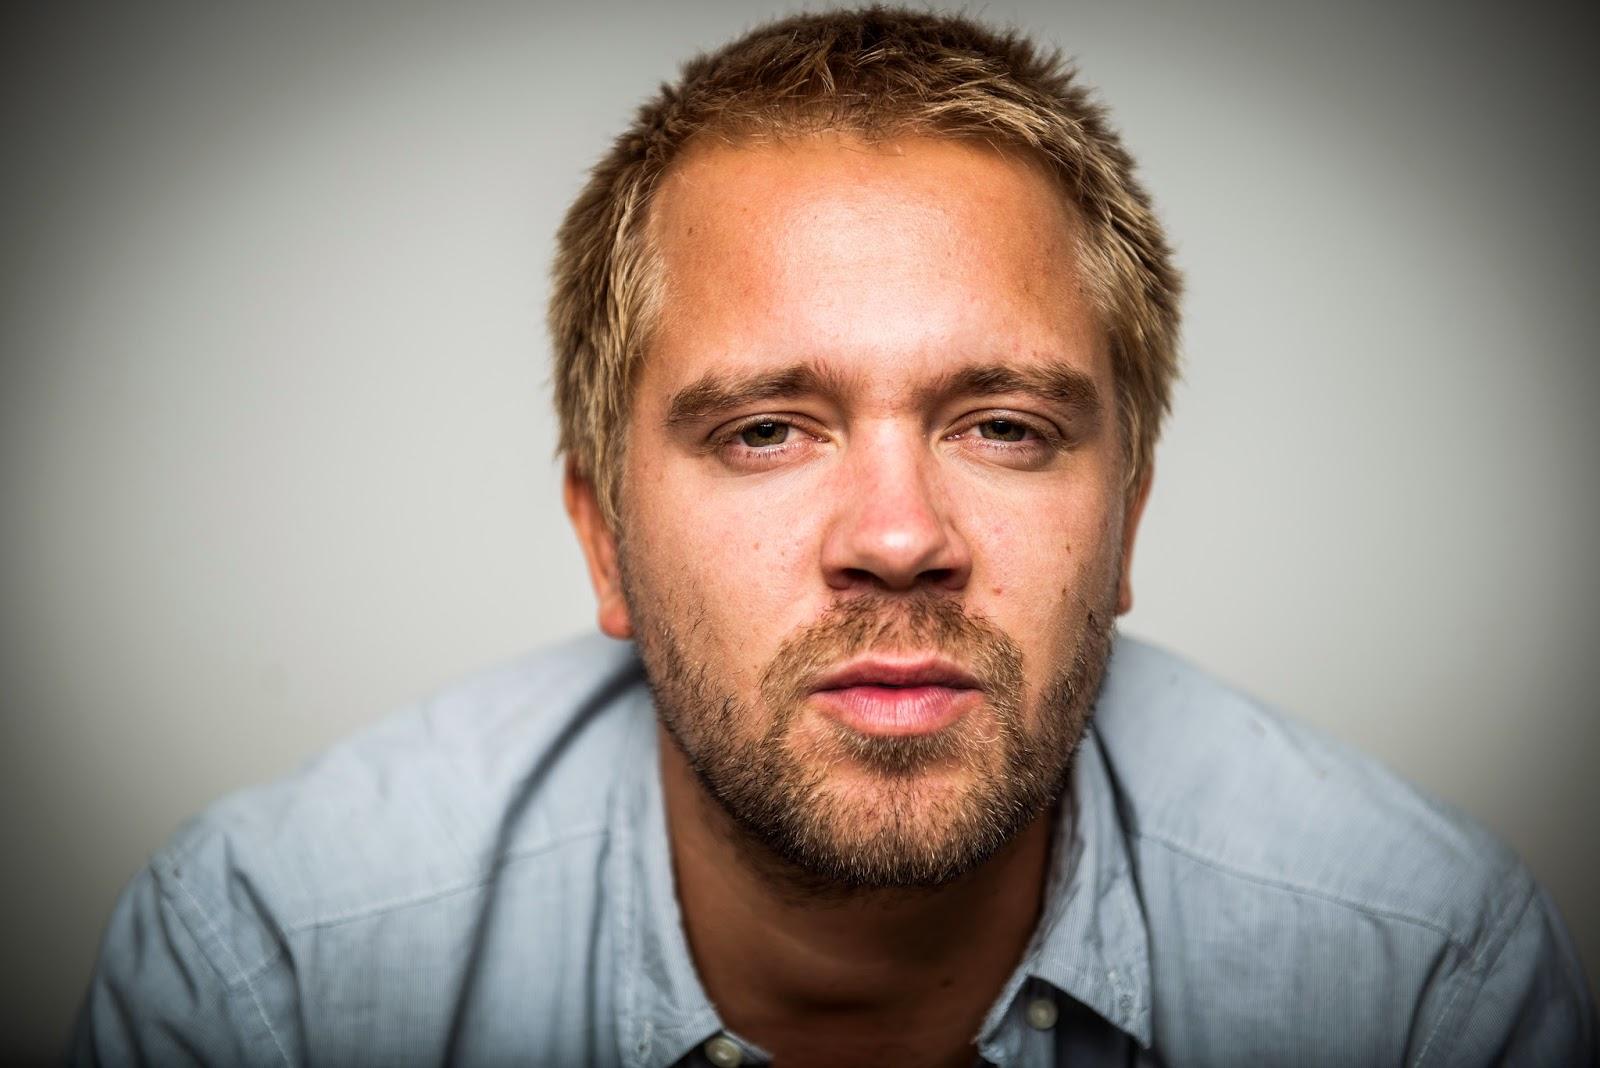 David Korbmann